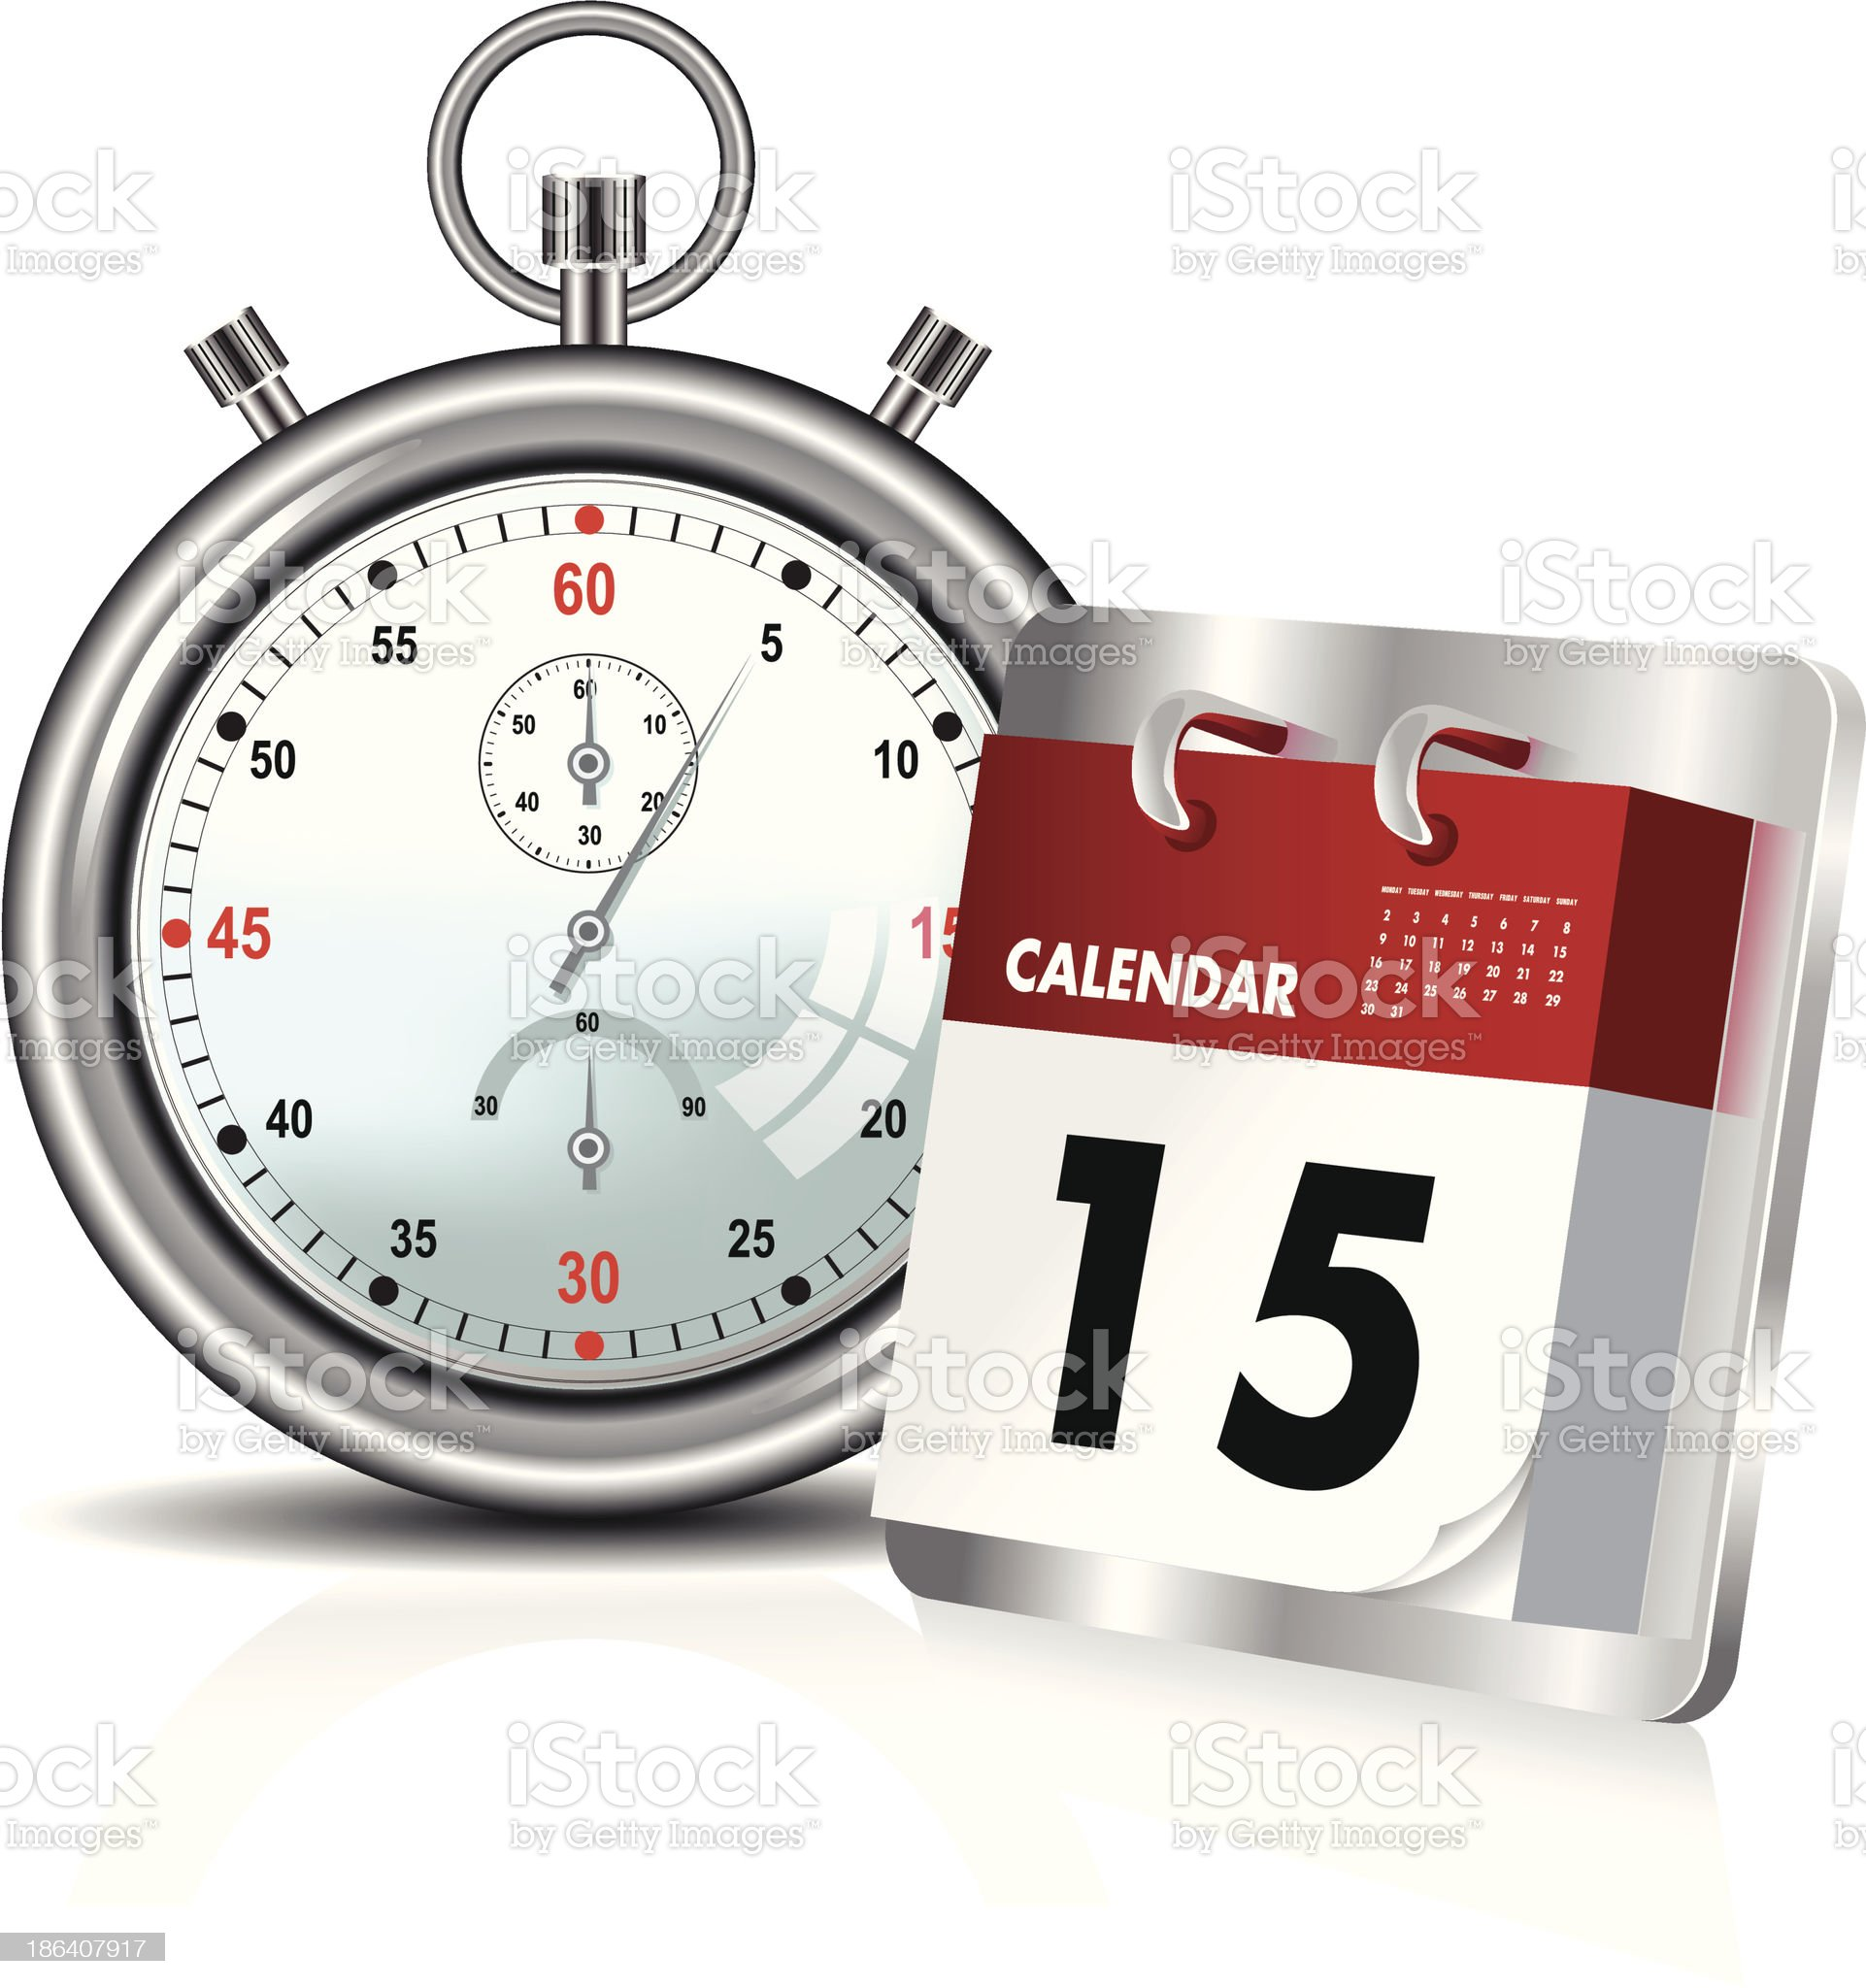 stopwatch and calendar royalty-free stock vector art